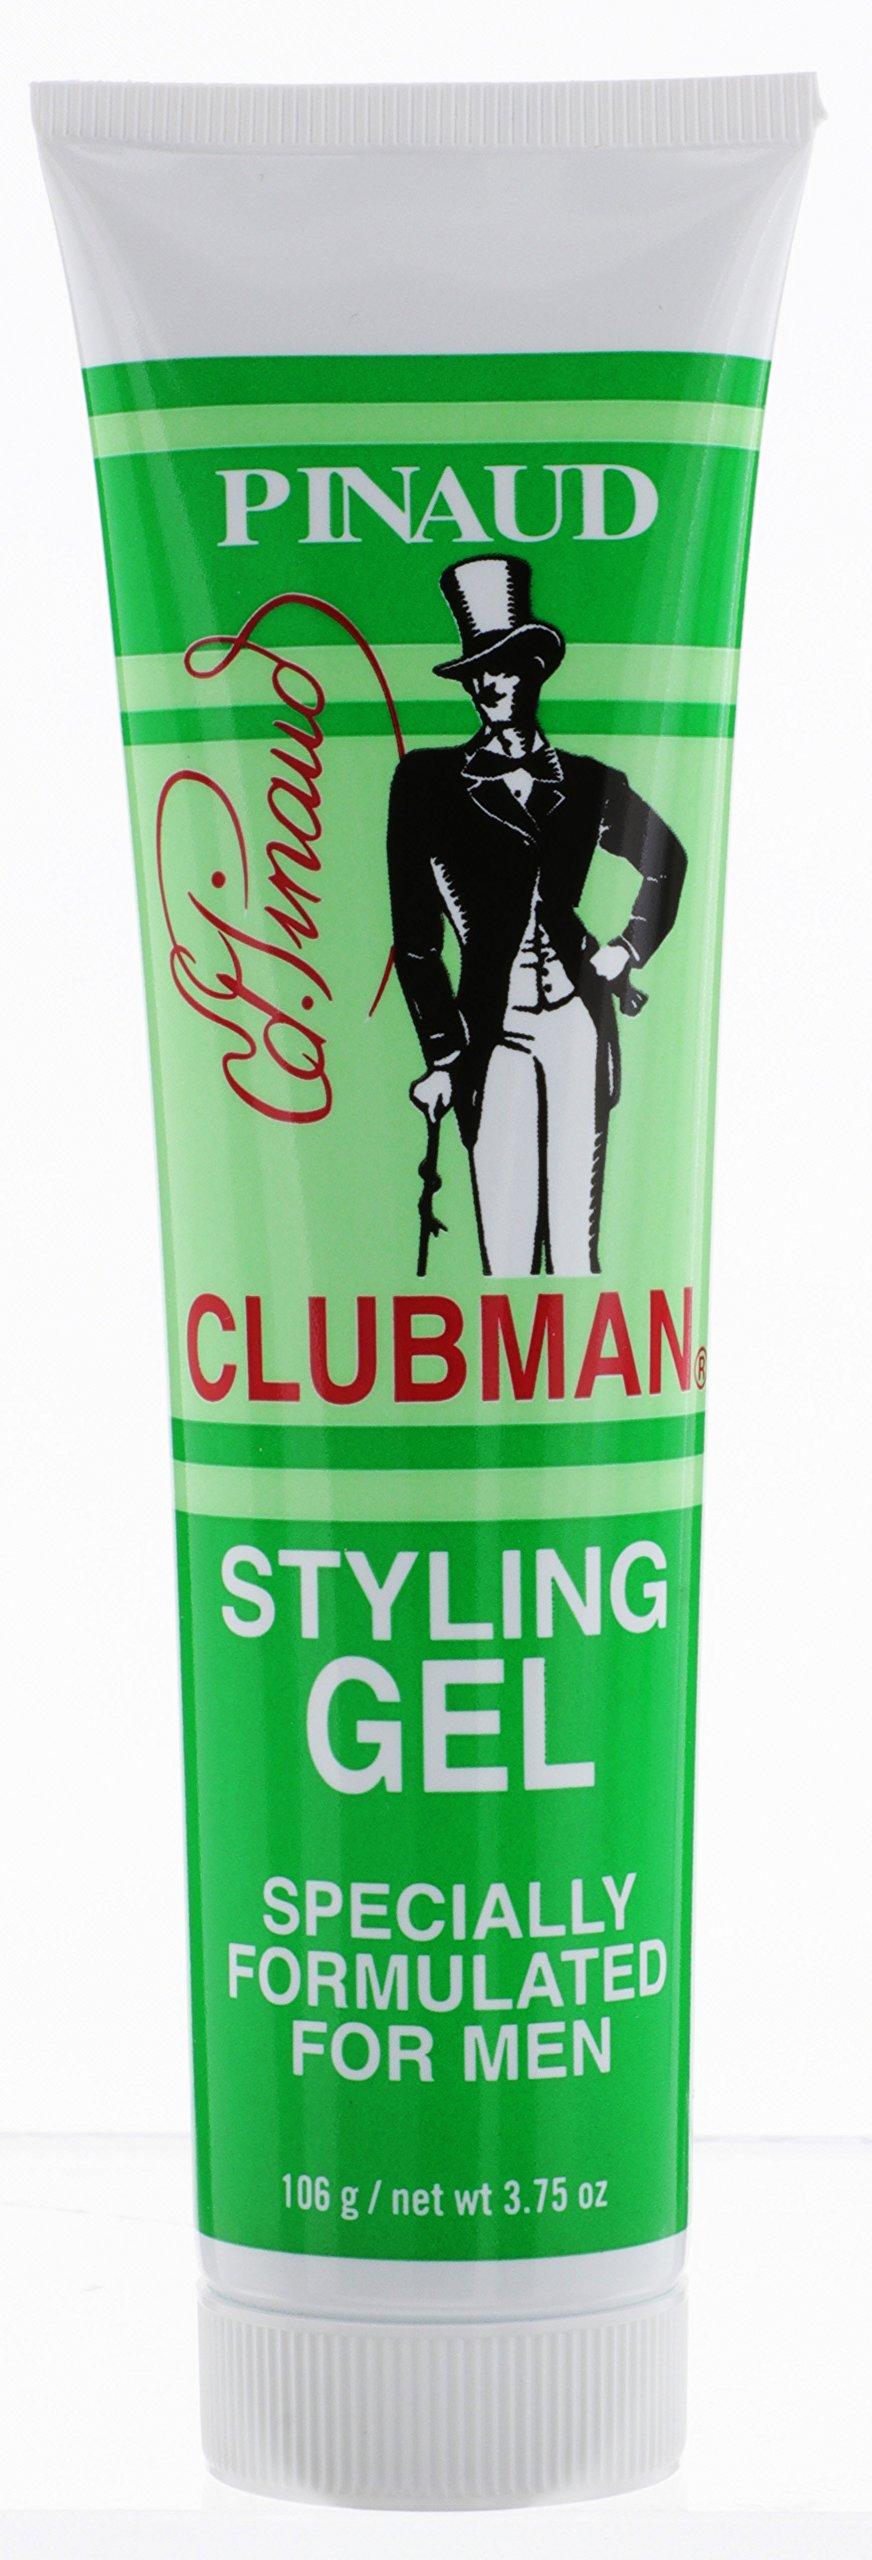 Clubman Pinaud Styling Gel Hair Groom for Men, 3.75-Ounce